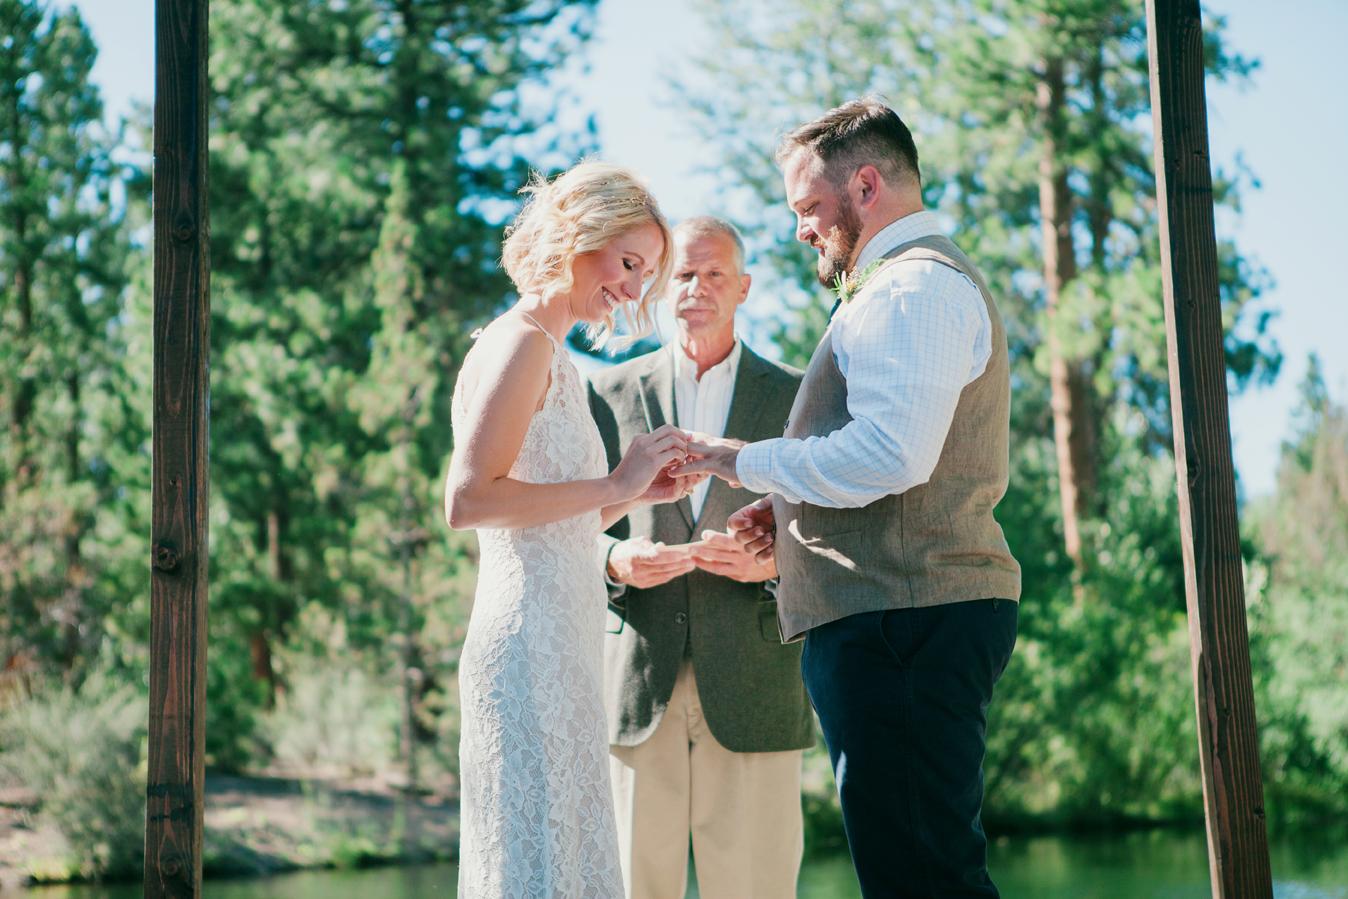 bend oregon wedding photographer - the suitcase studio